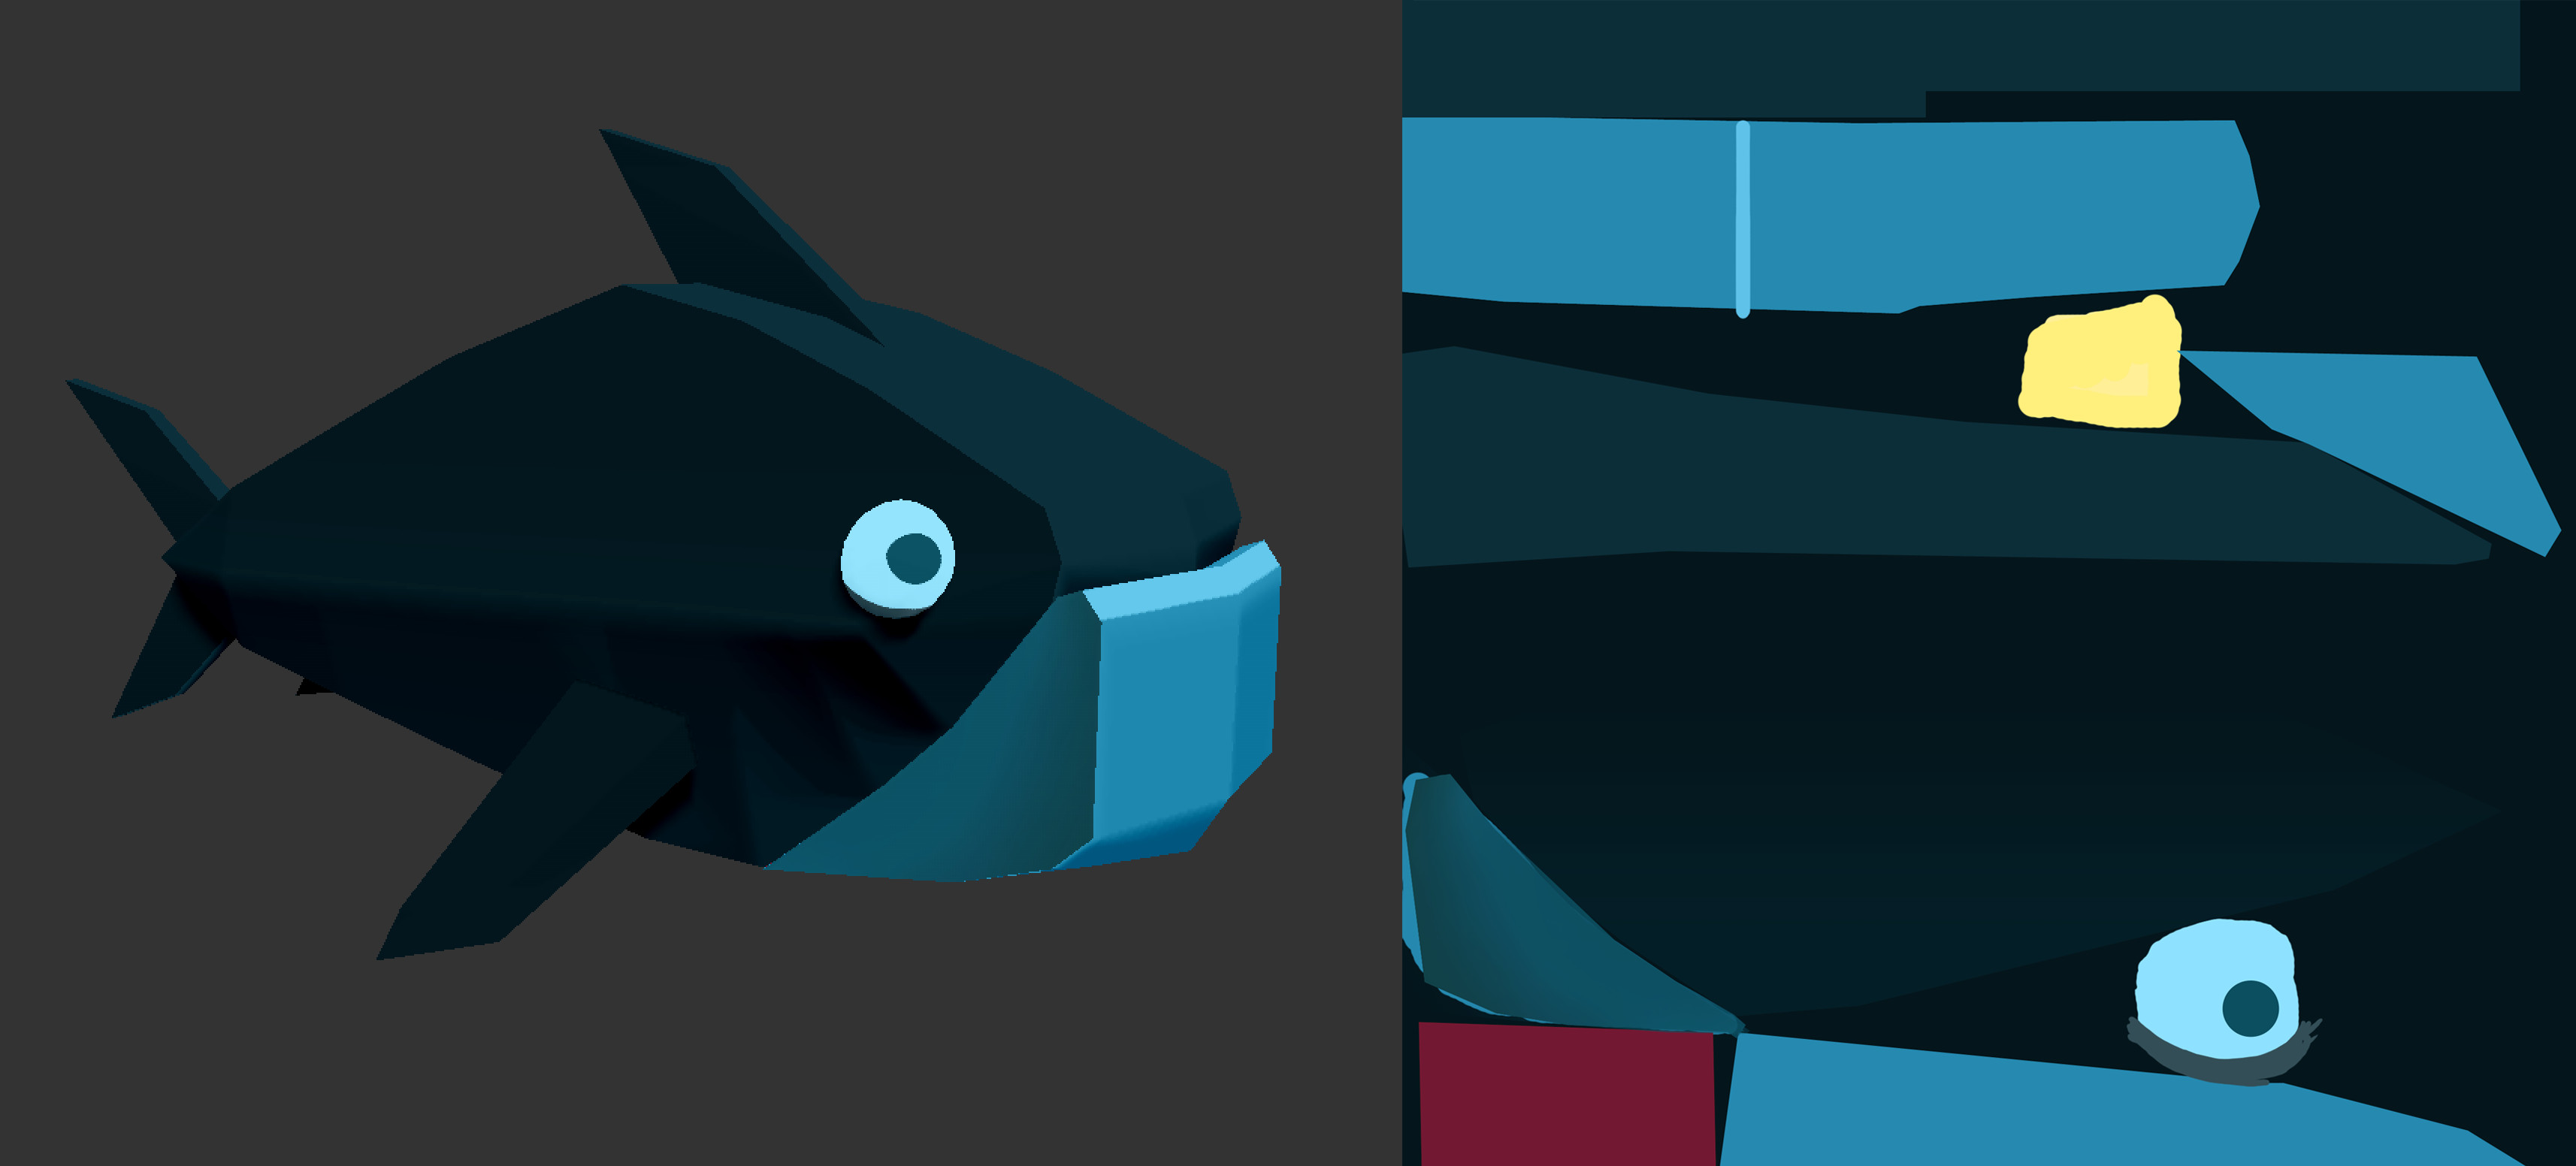 PaperPunk Whale